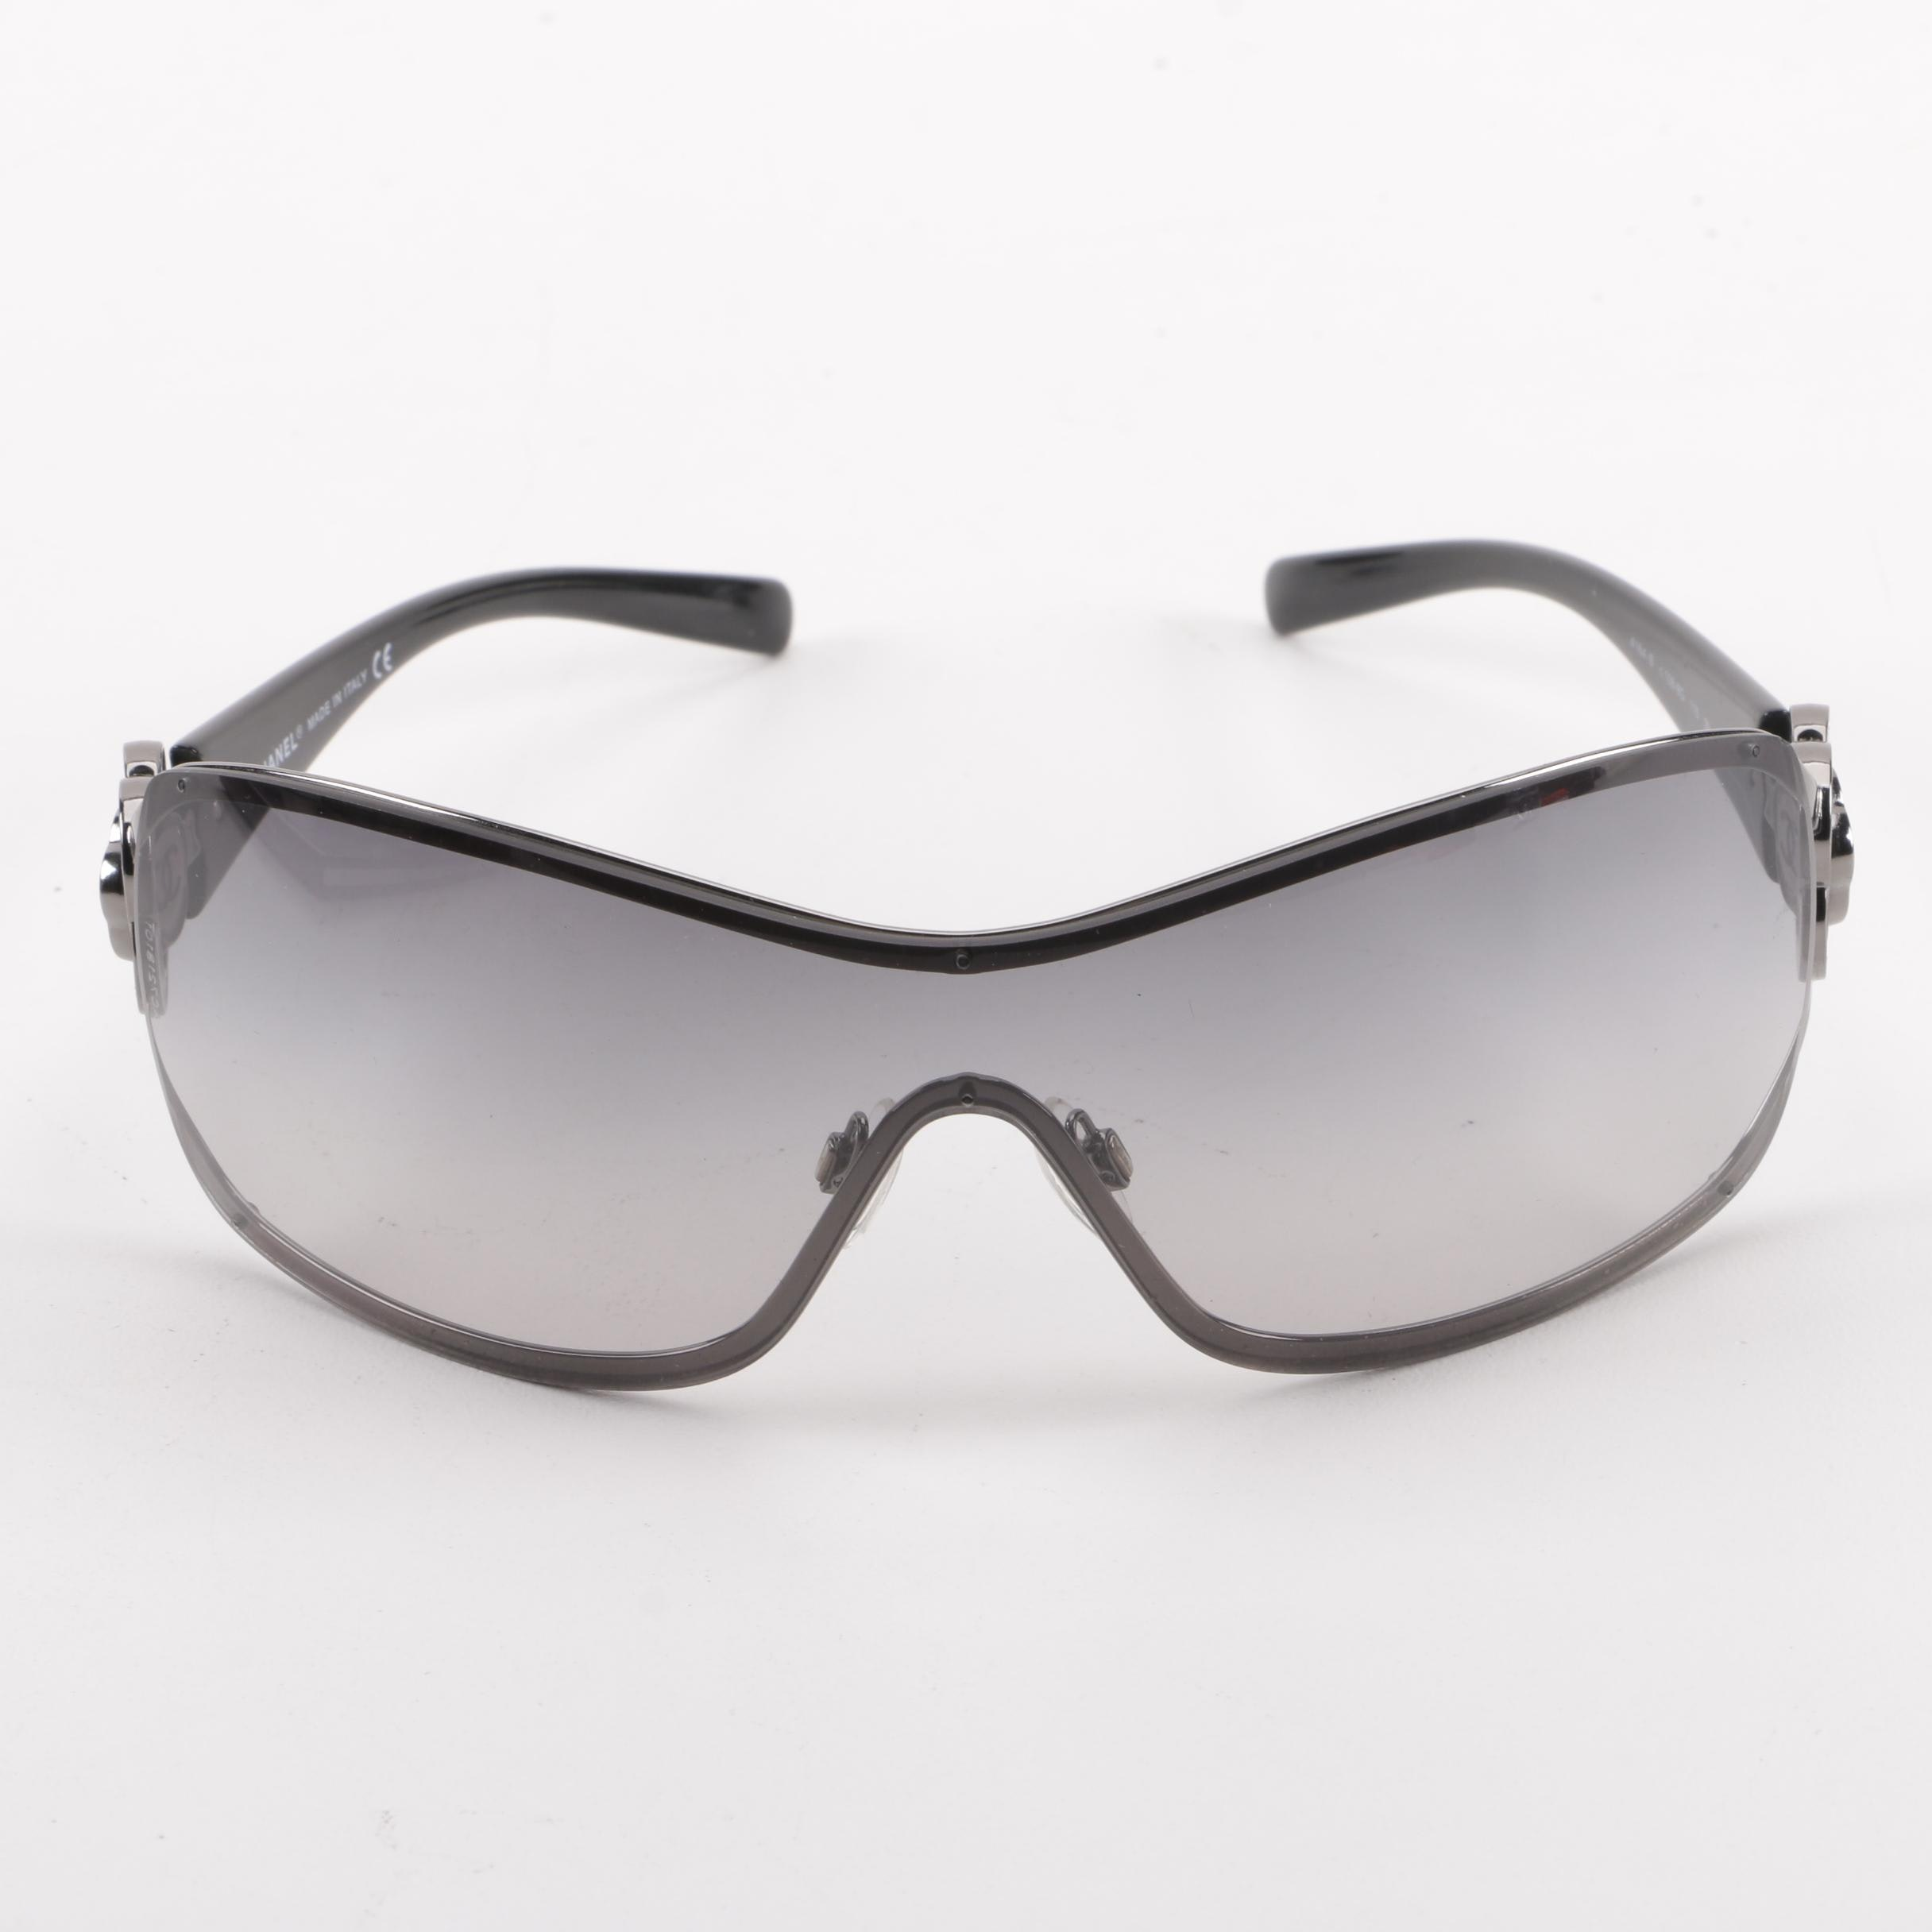 Chanel 4164-B Shield Sunglasses with Case